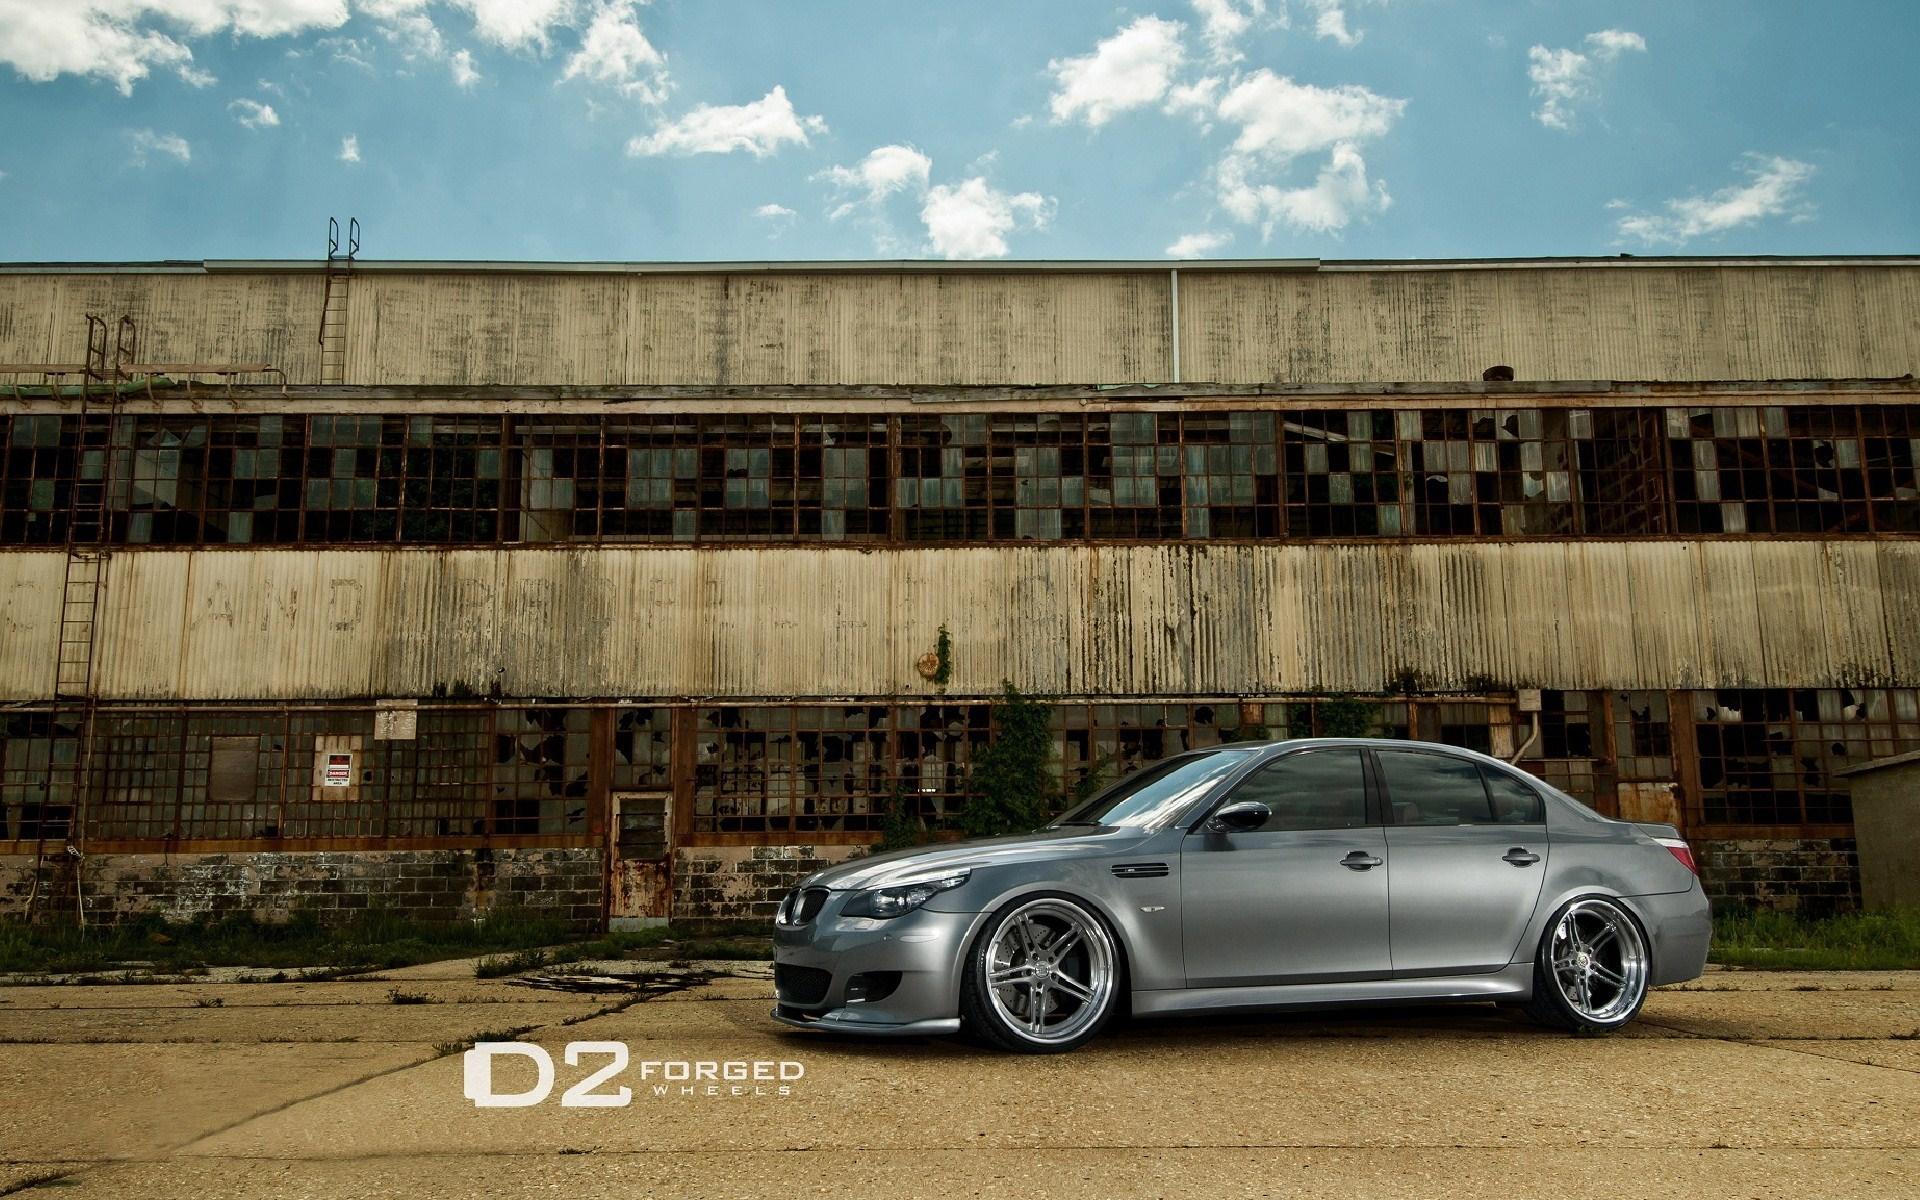 BMW M5 D2Forged Wheels Tuning Car HD Wallpaper